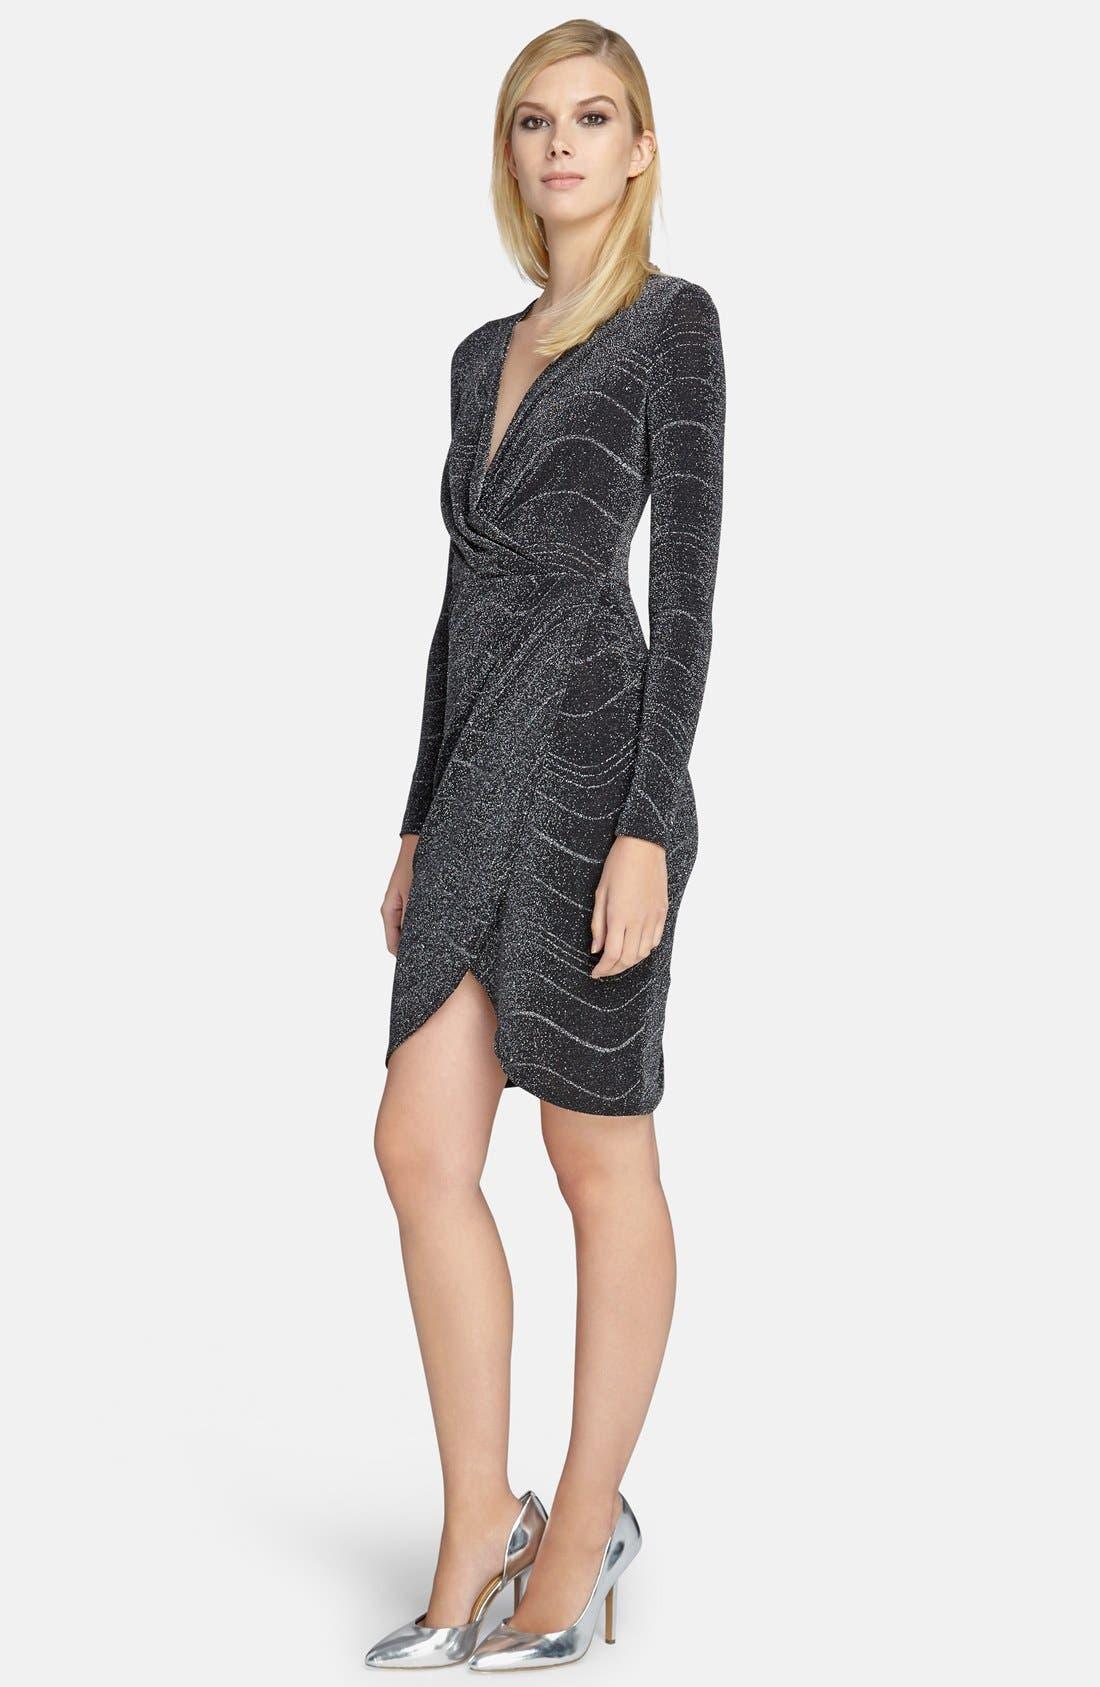 Main Image - Catherine Catherine Malandrino 'Marilyn' Metallic Kit Dress